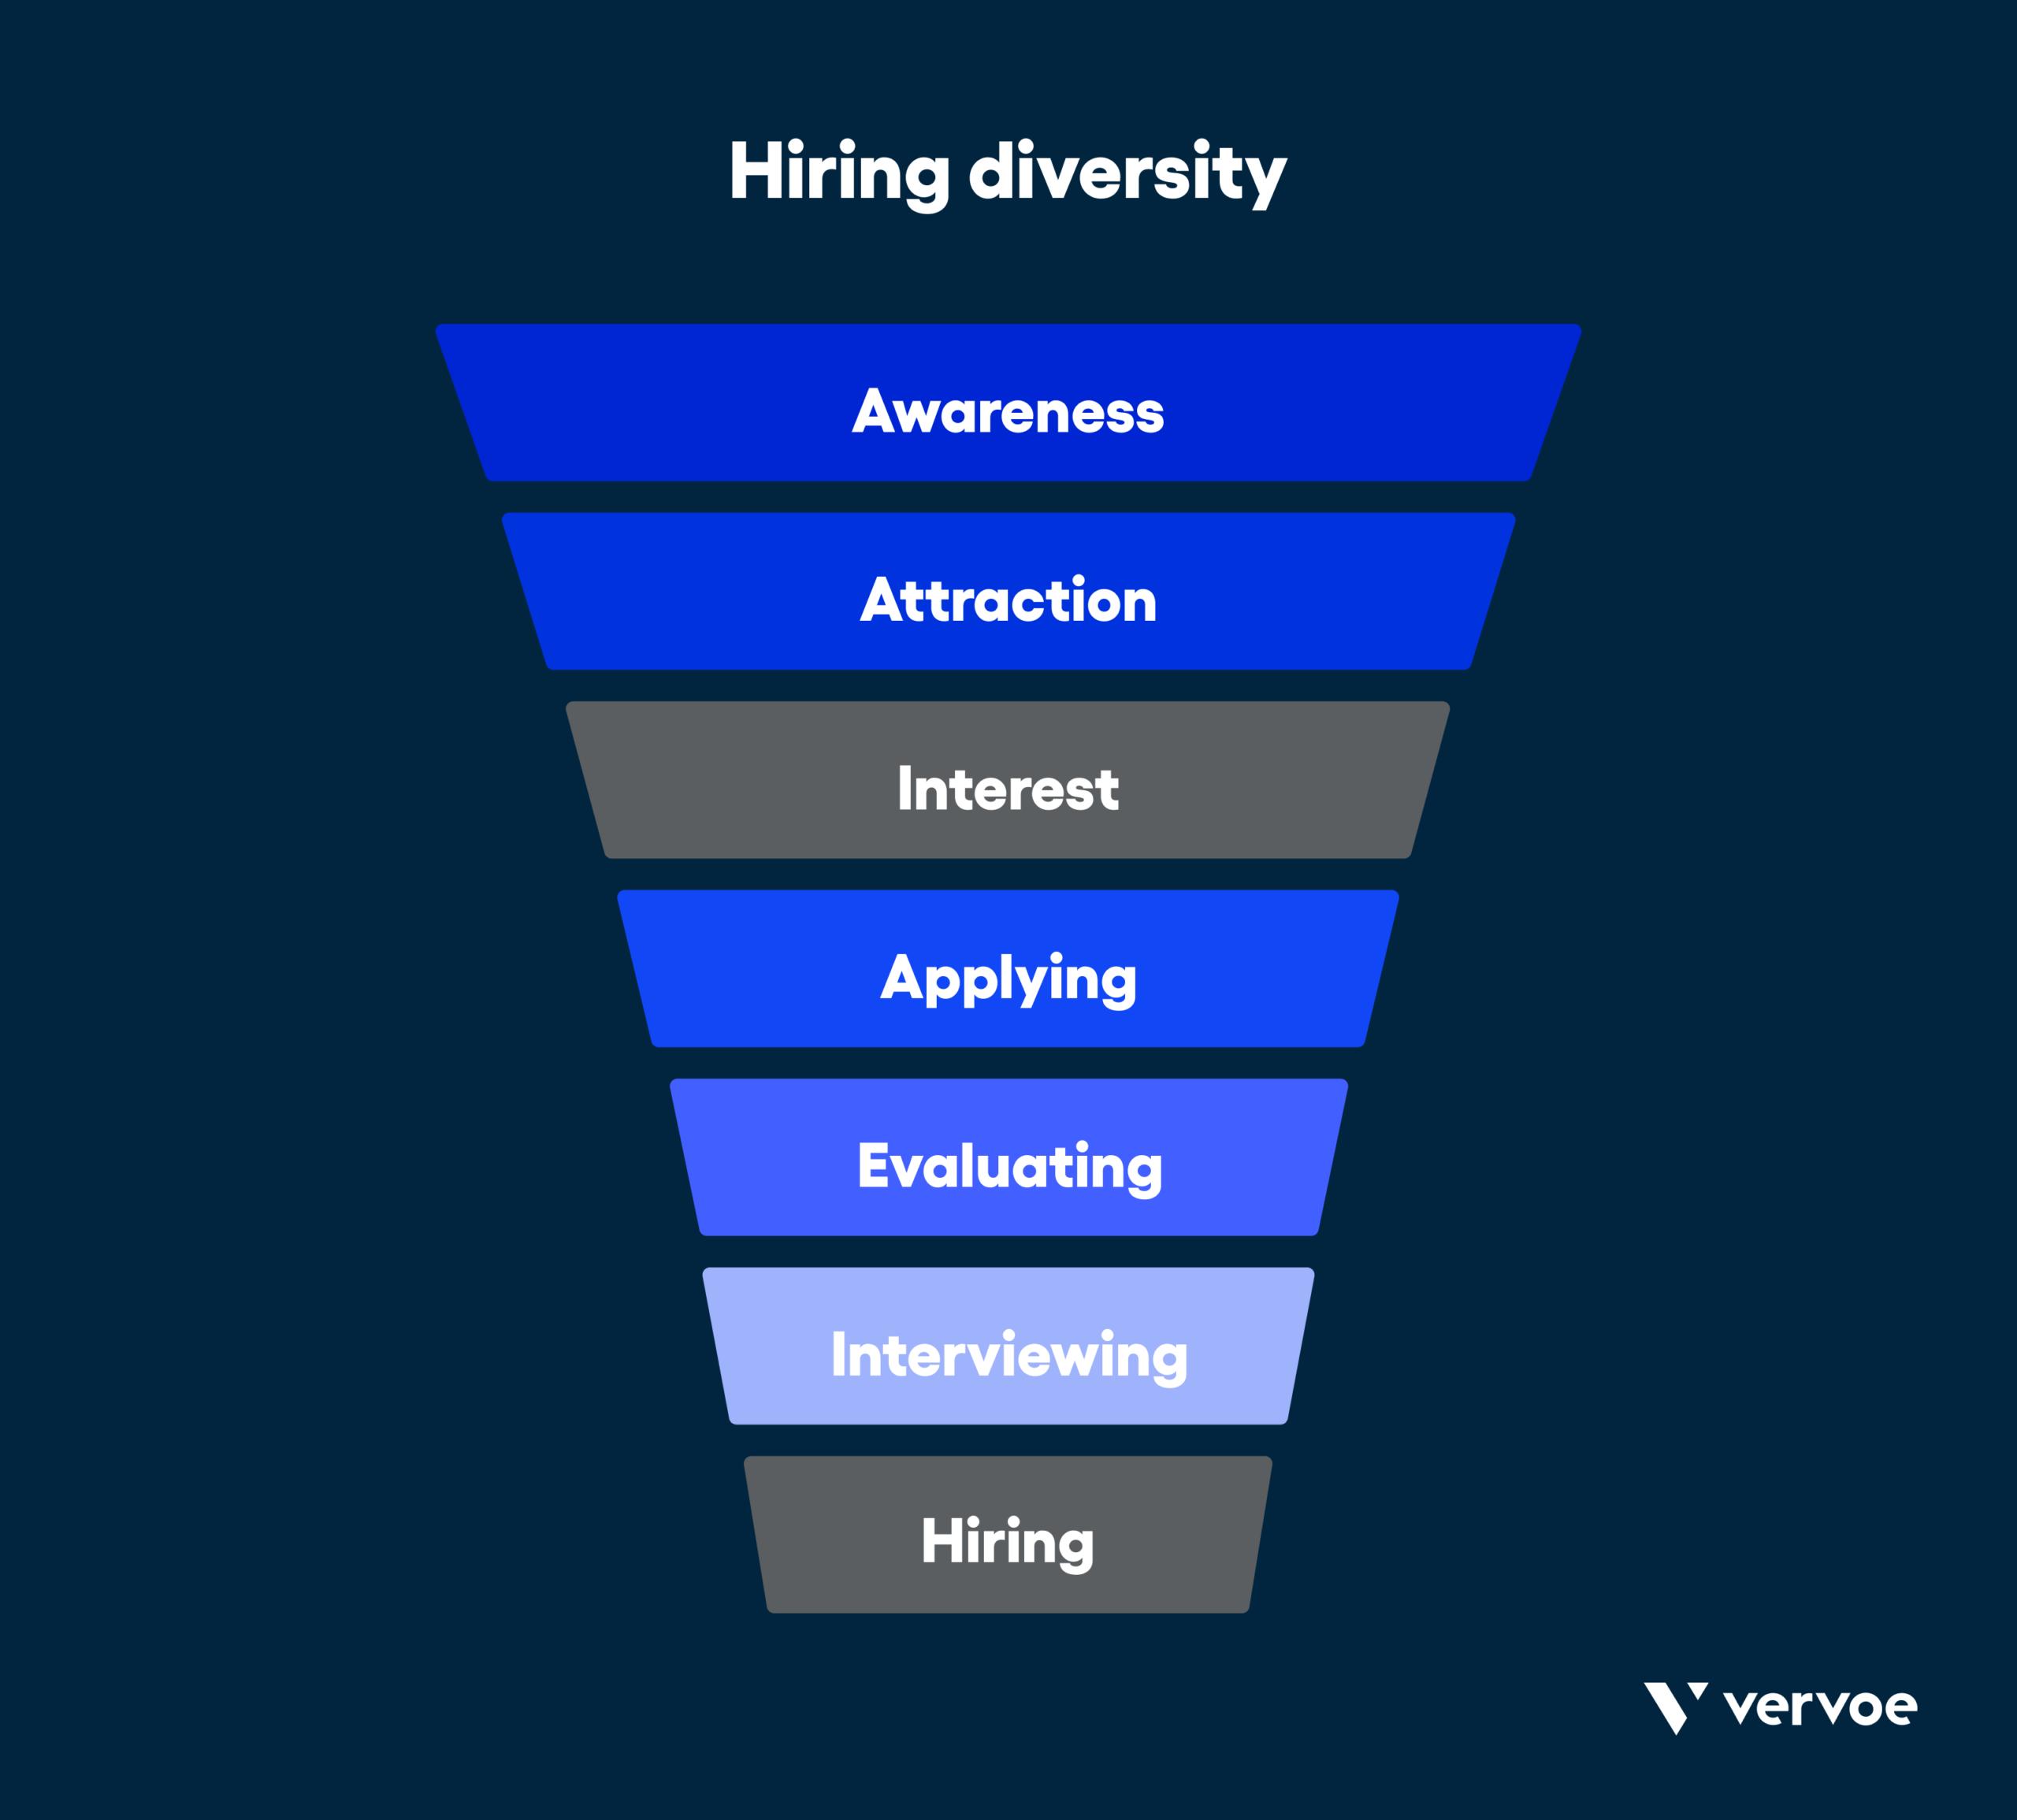 Hiring diversity